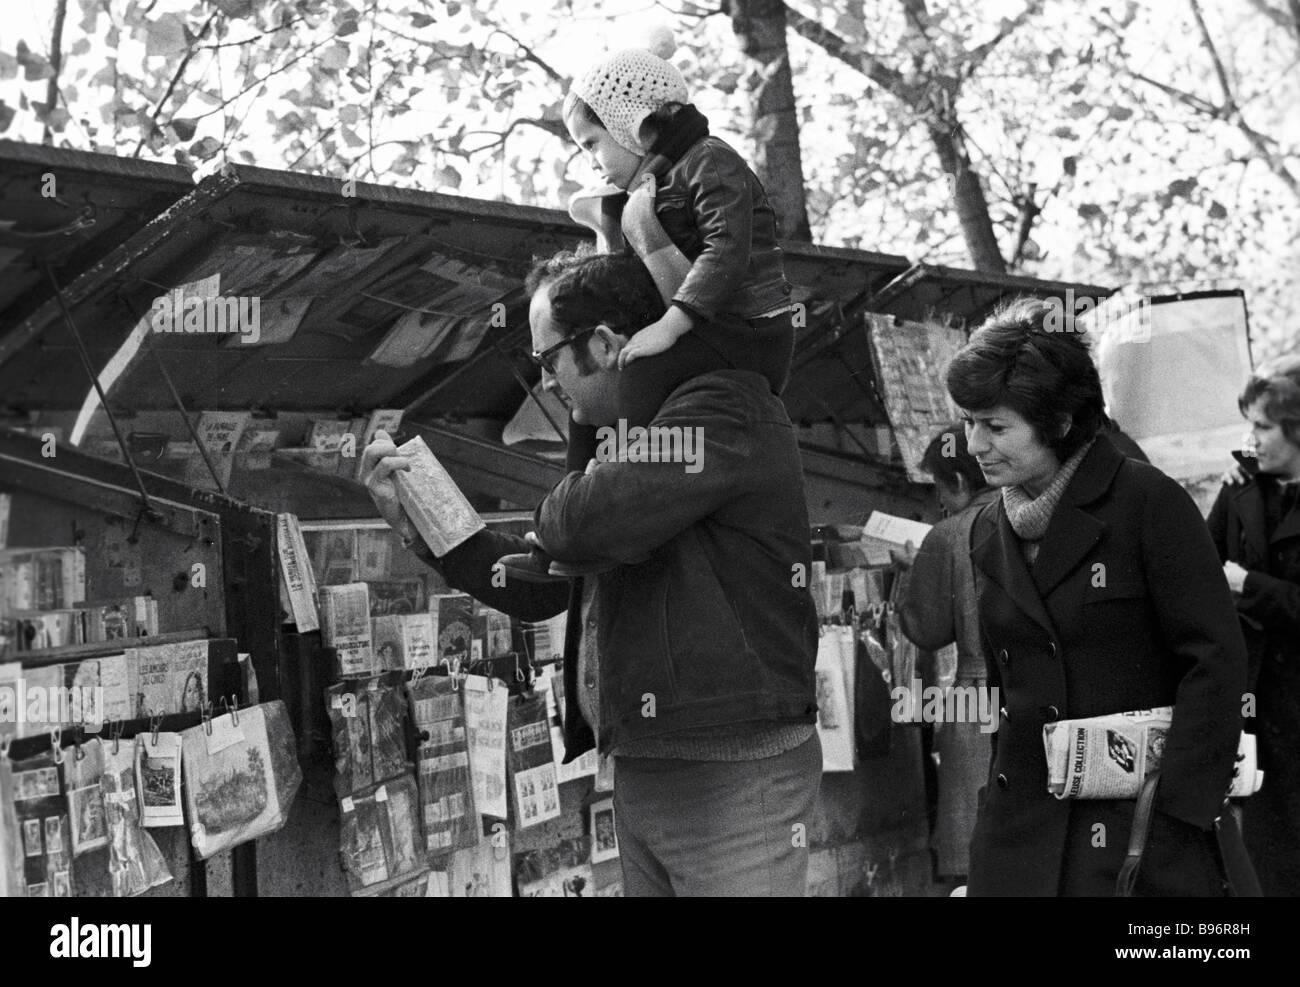 Parisians looking at rare books on the Seine embankment - Stock Image